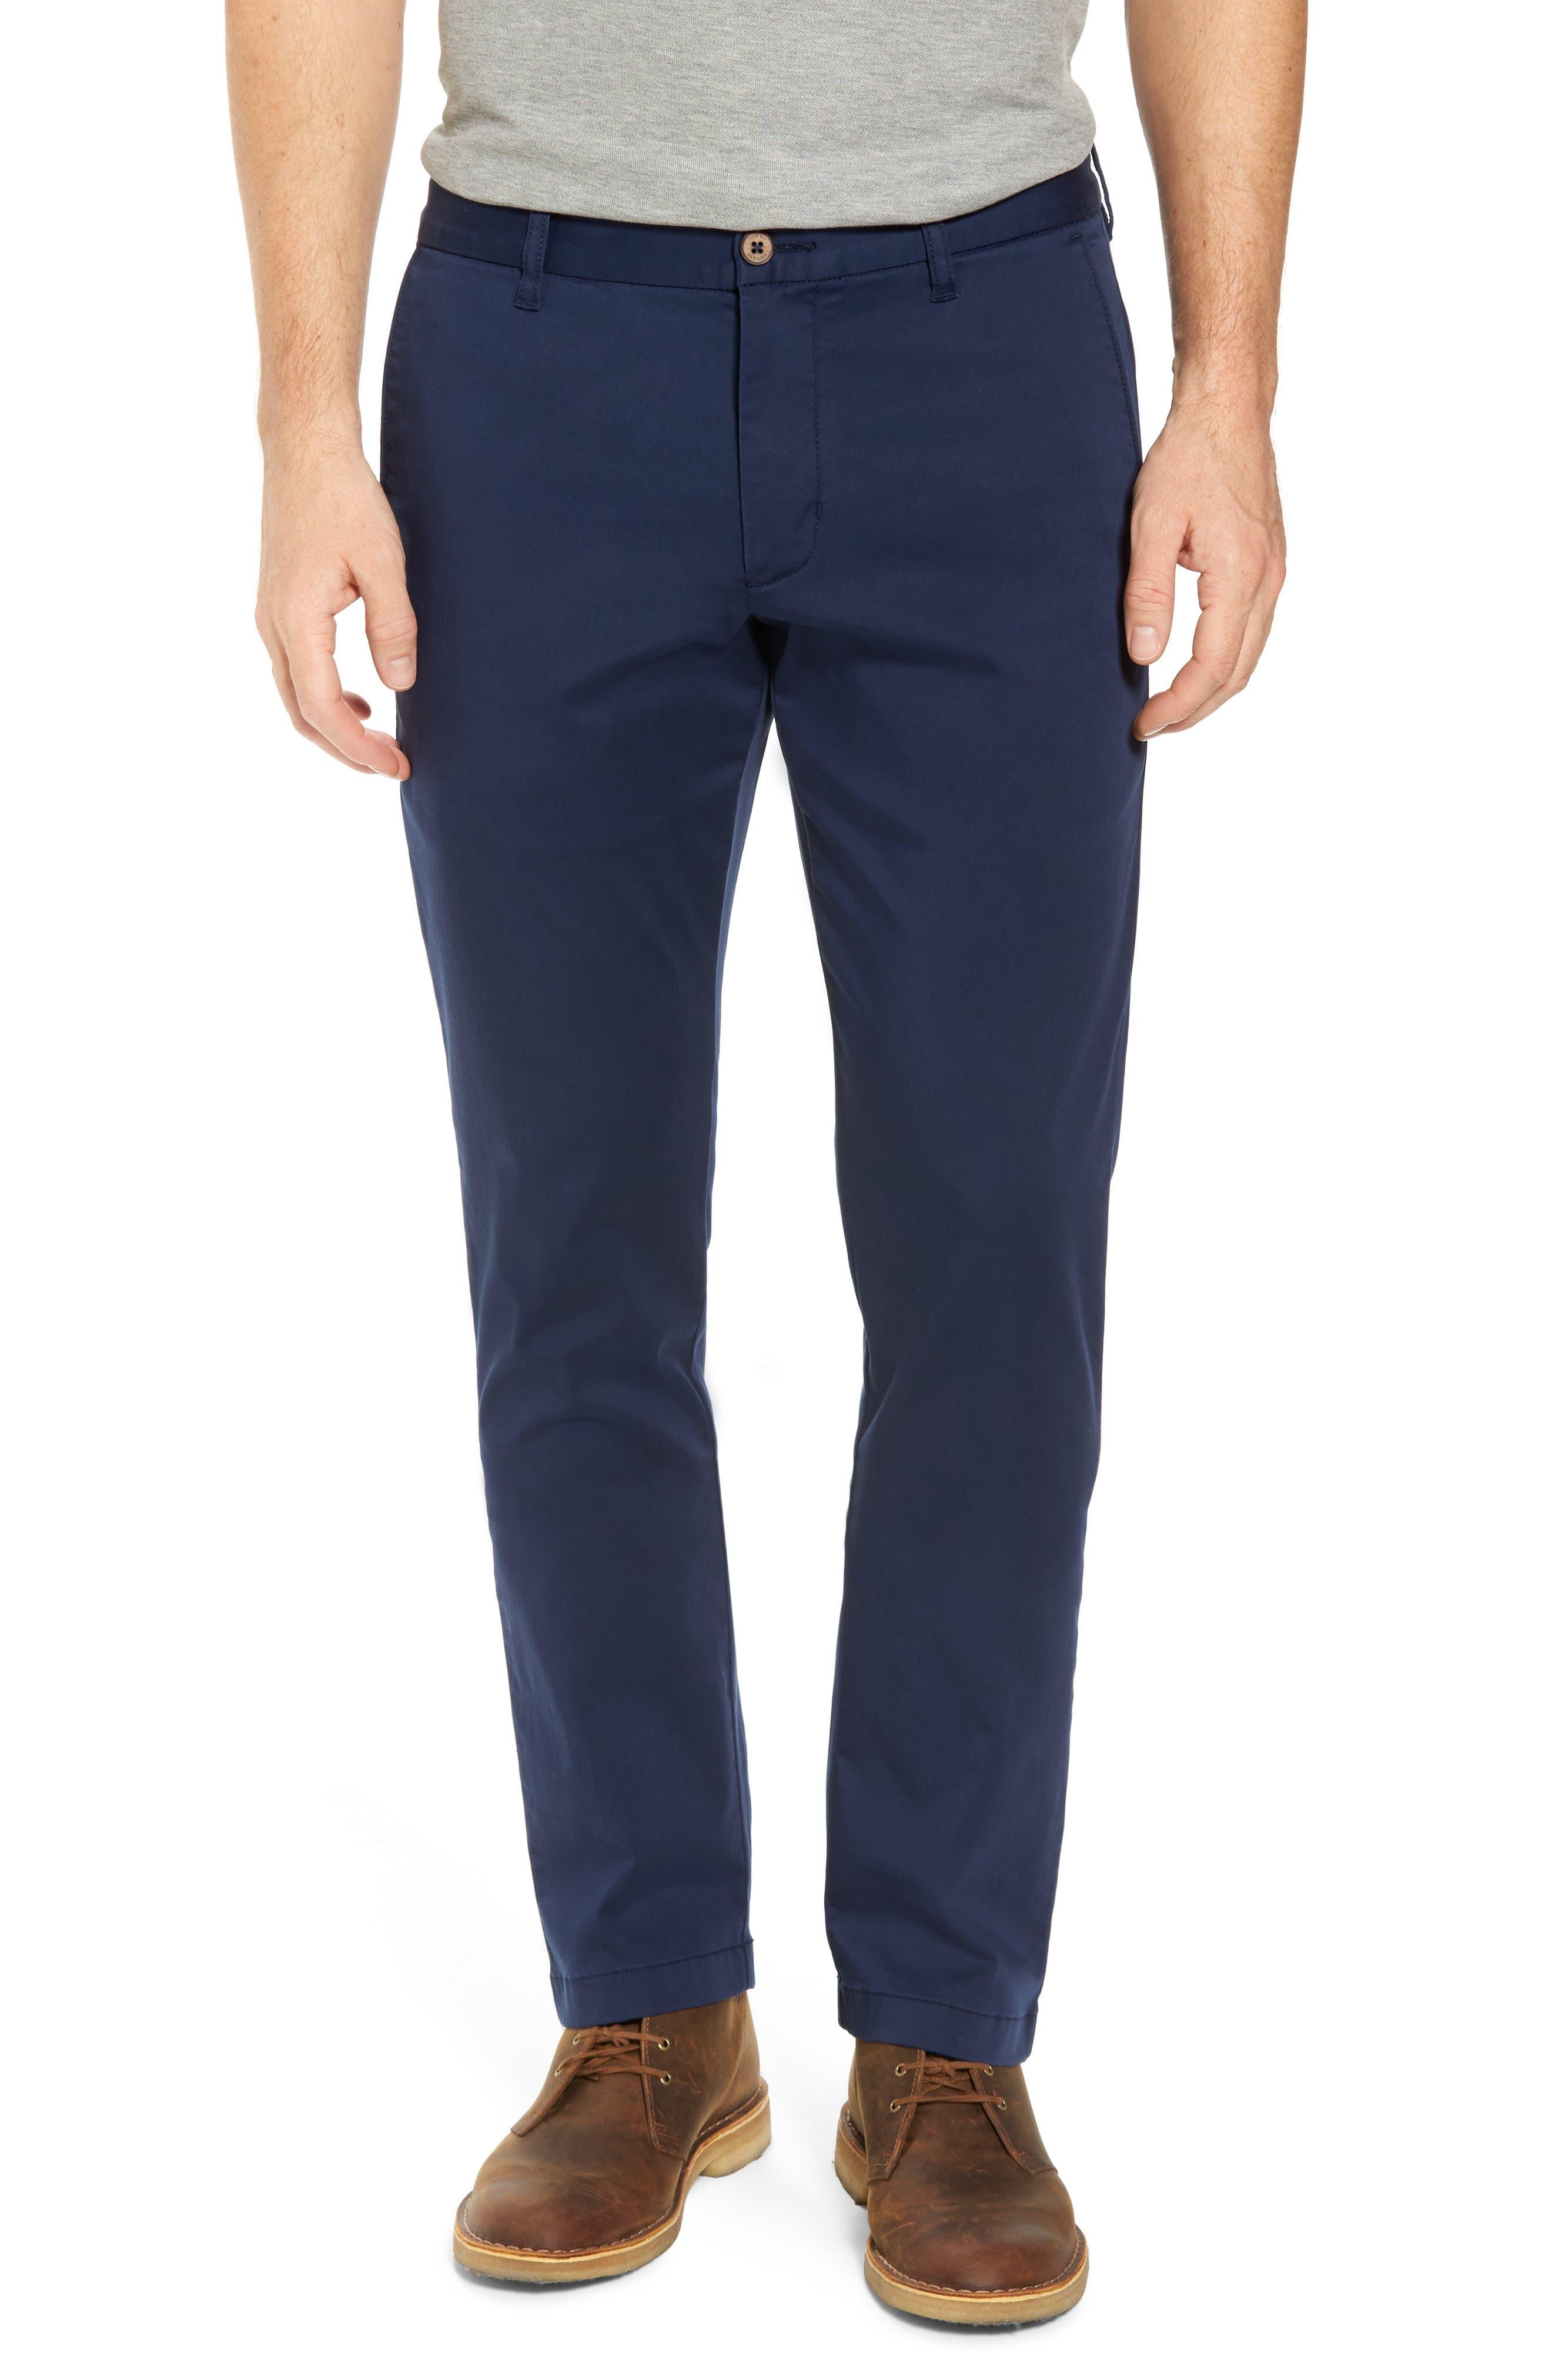 Boracay Flat Front Pants,                         Main,                         color, Maritime